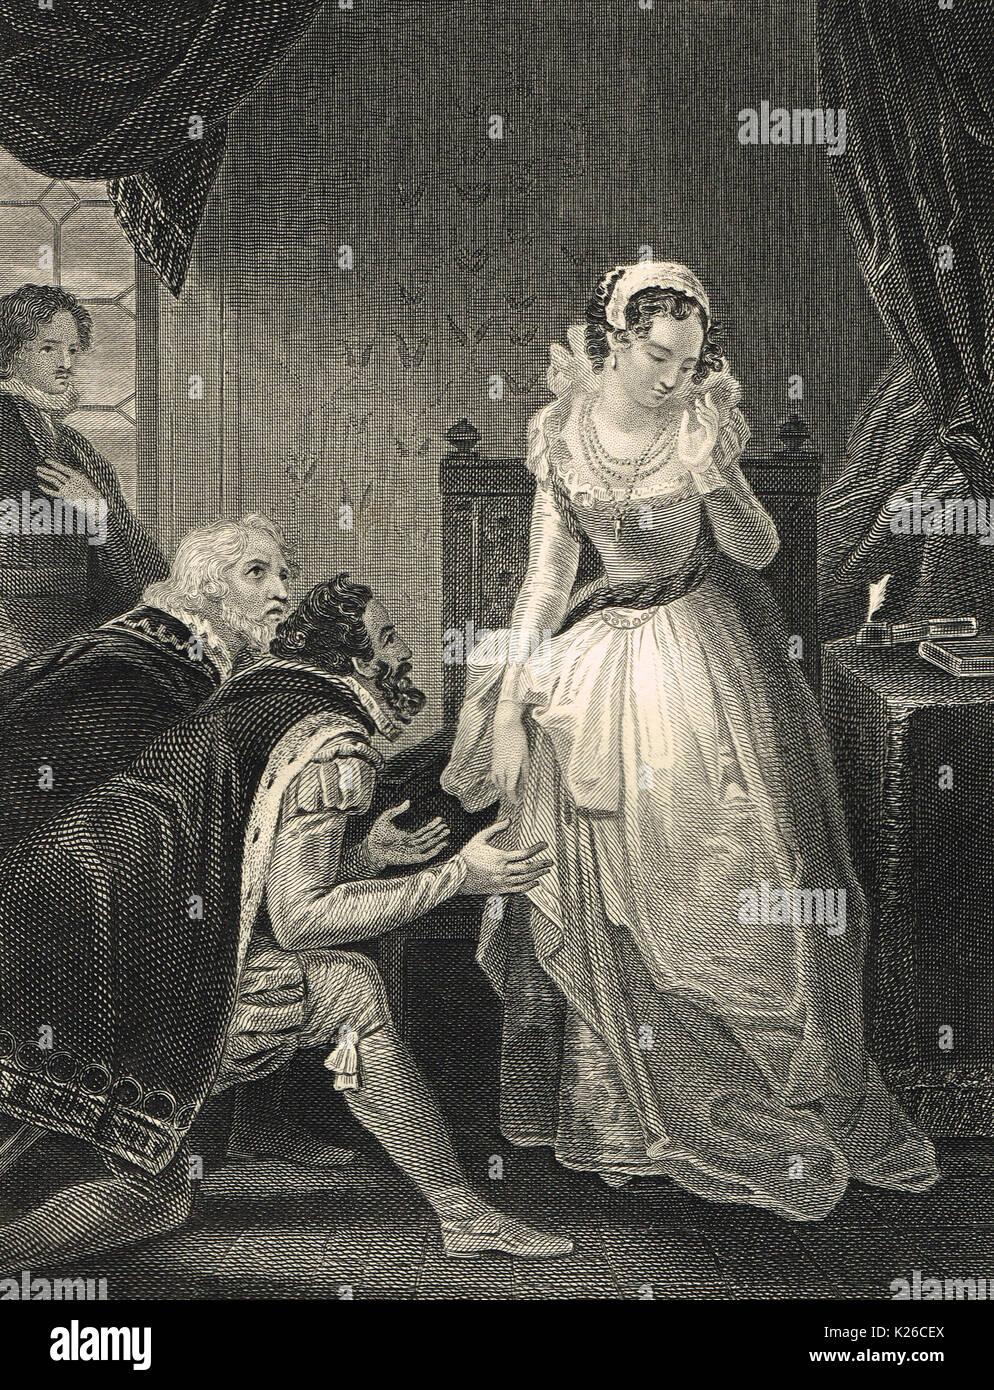 Lady Jane Grey declining the English crown, 1553 - Stock Image